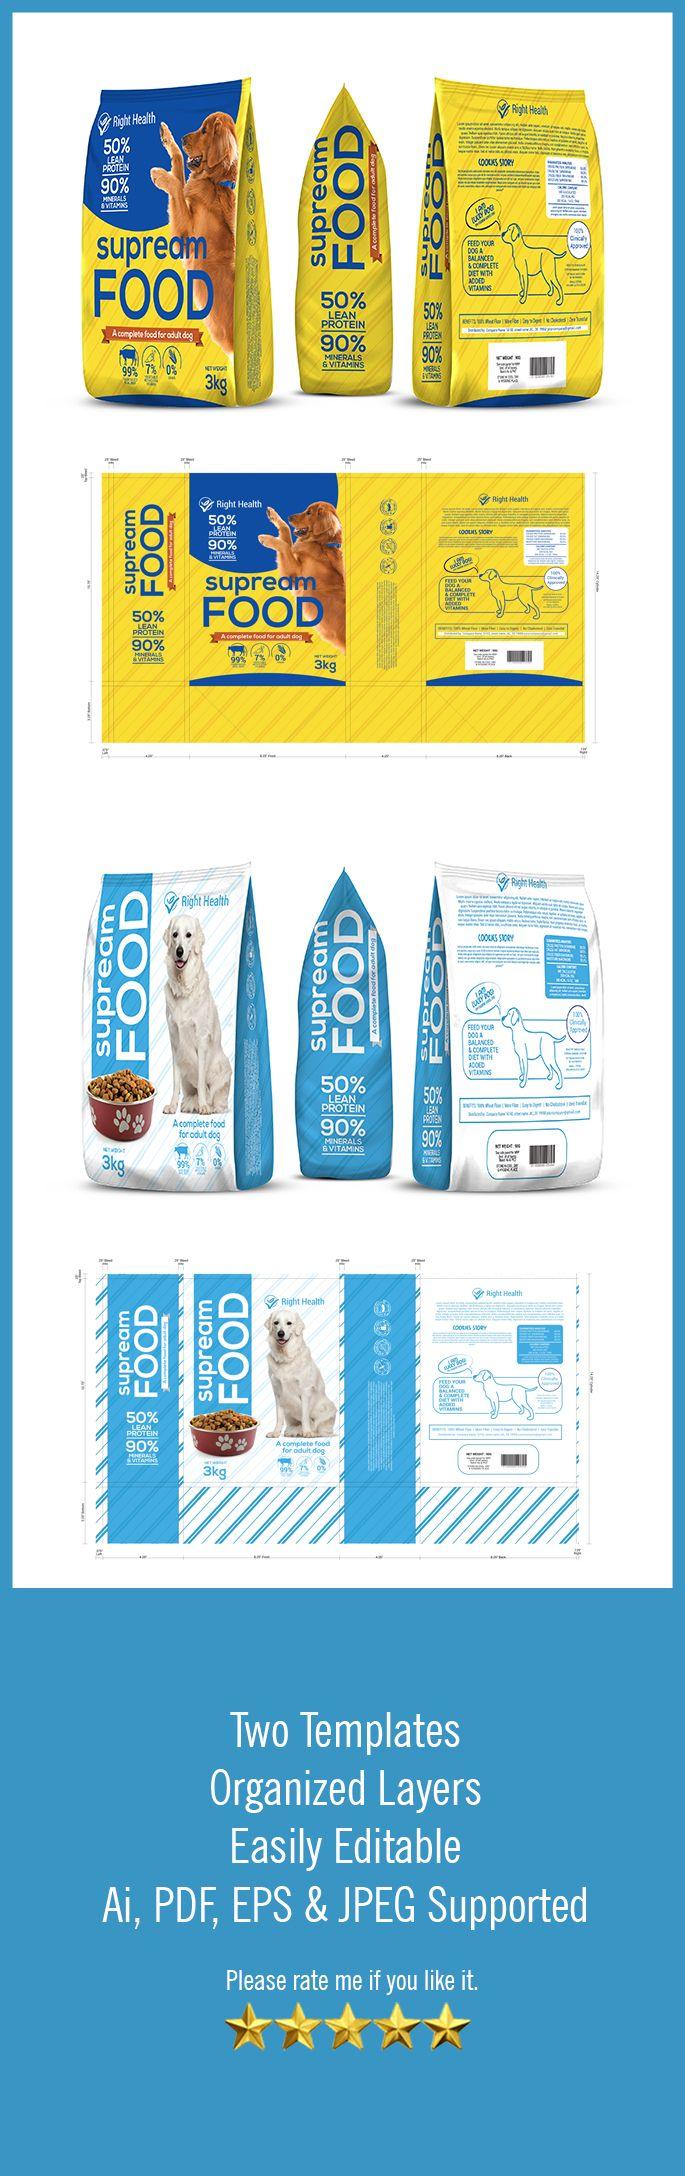 Download Dog Food Packaging Template Vol 41 Packaging Seller Packaging Template Packaging Template Design Pet Food Packaging